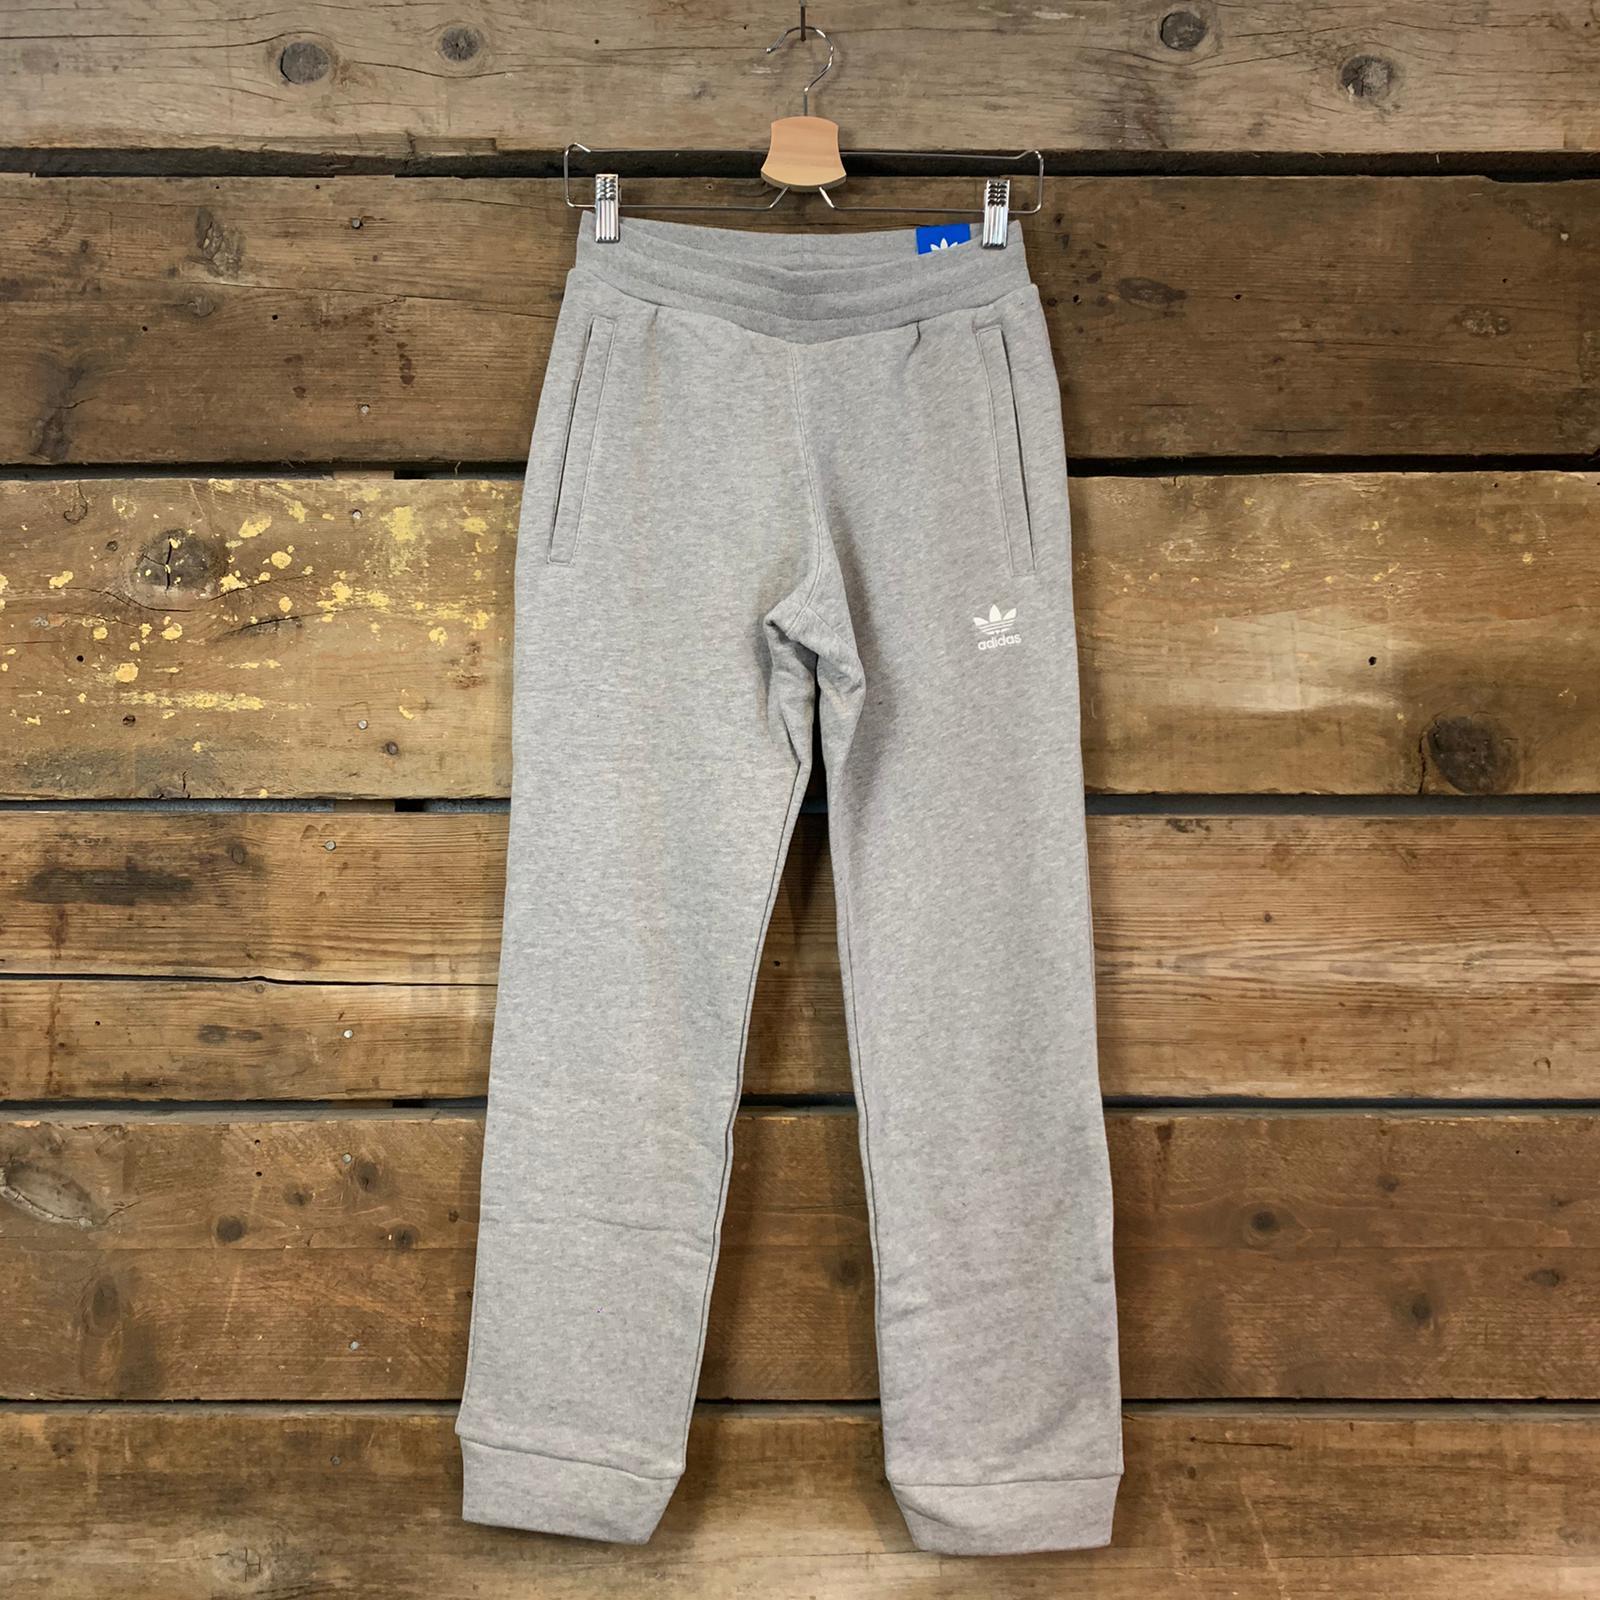 Pantalone Adidas Trefoil Slim Pant Grigio